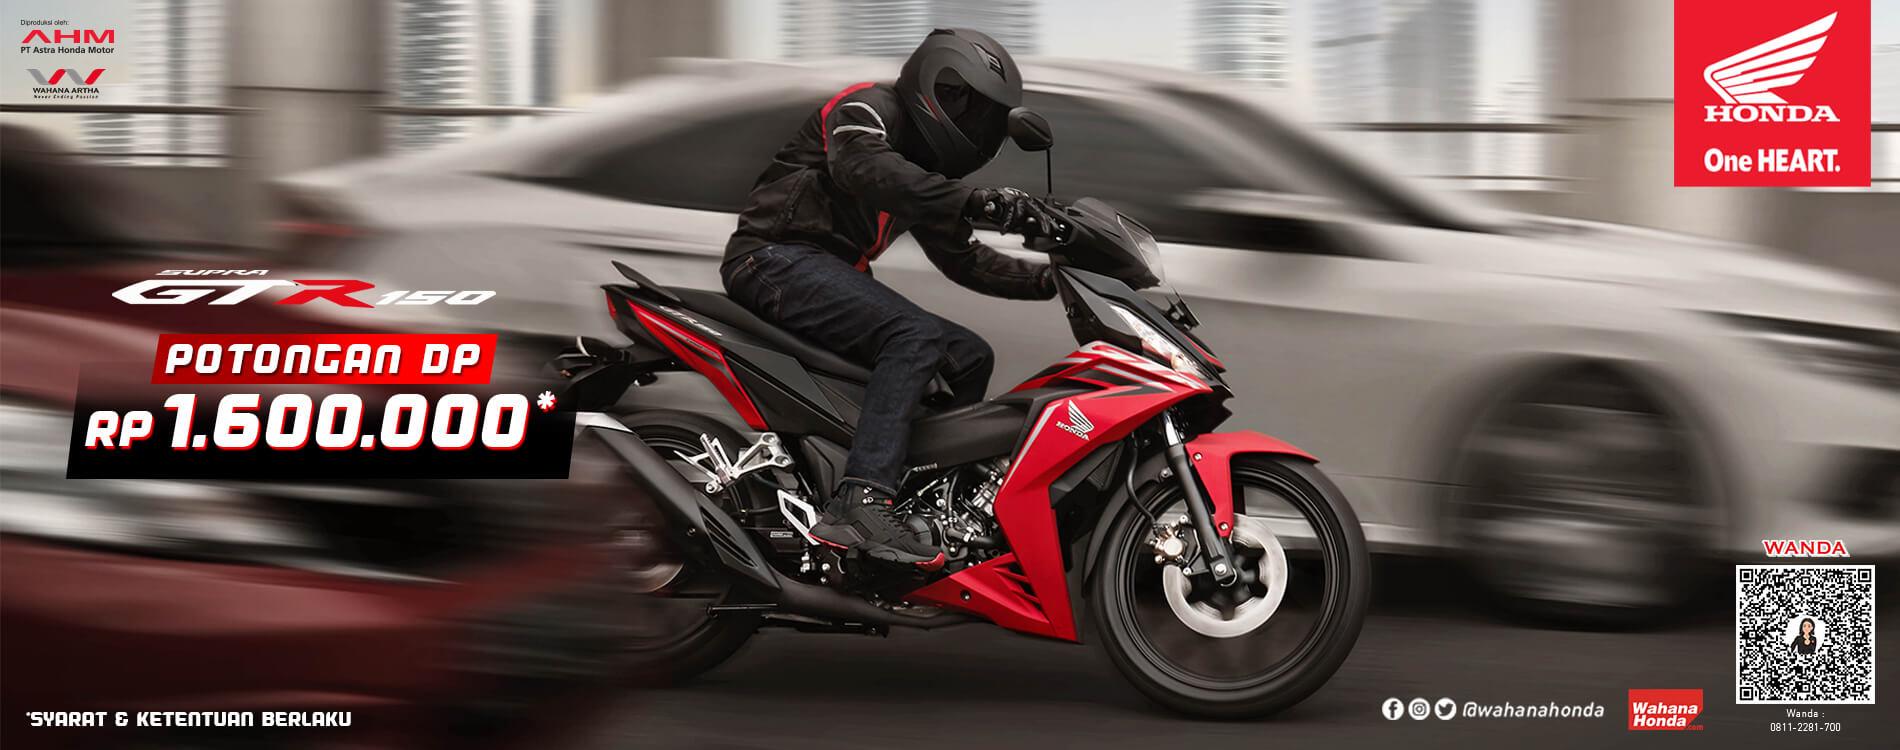 Promo Honda Supra GTR150 - Periode Mei 2021